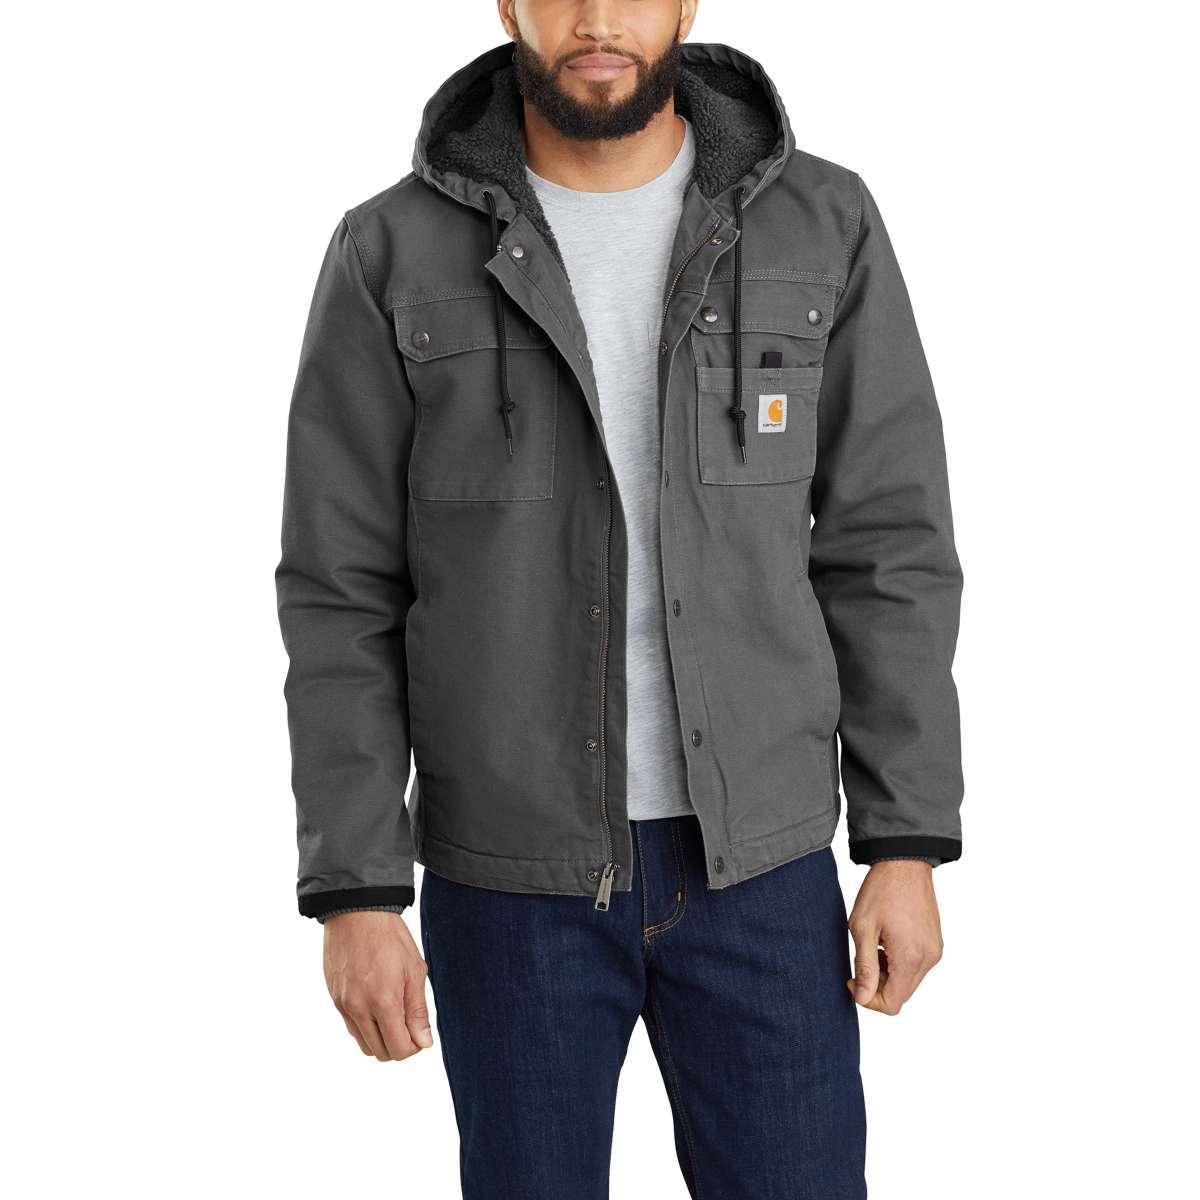 Carhartt Men's Bartlett Jacket, Extended Sizes - Black, 4XL